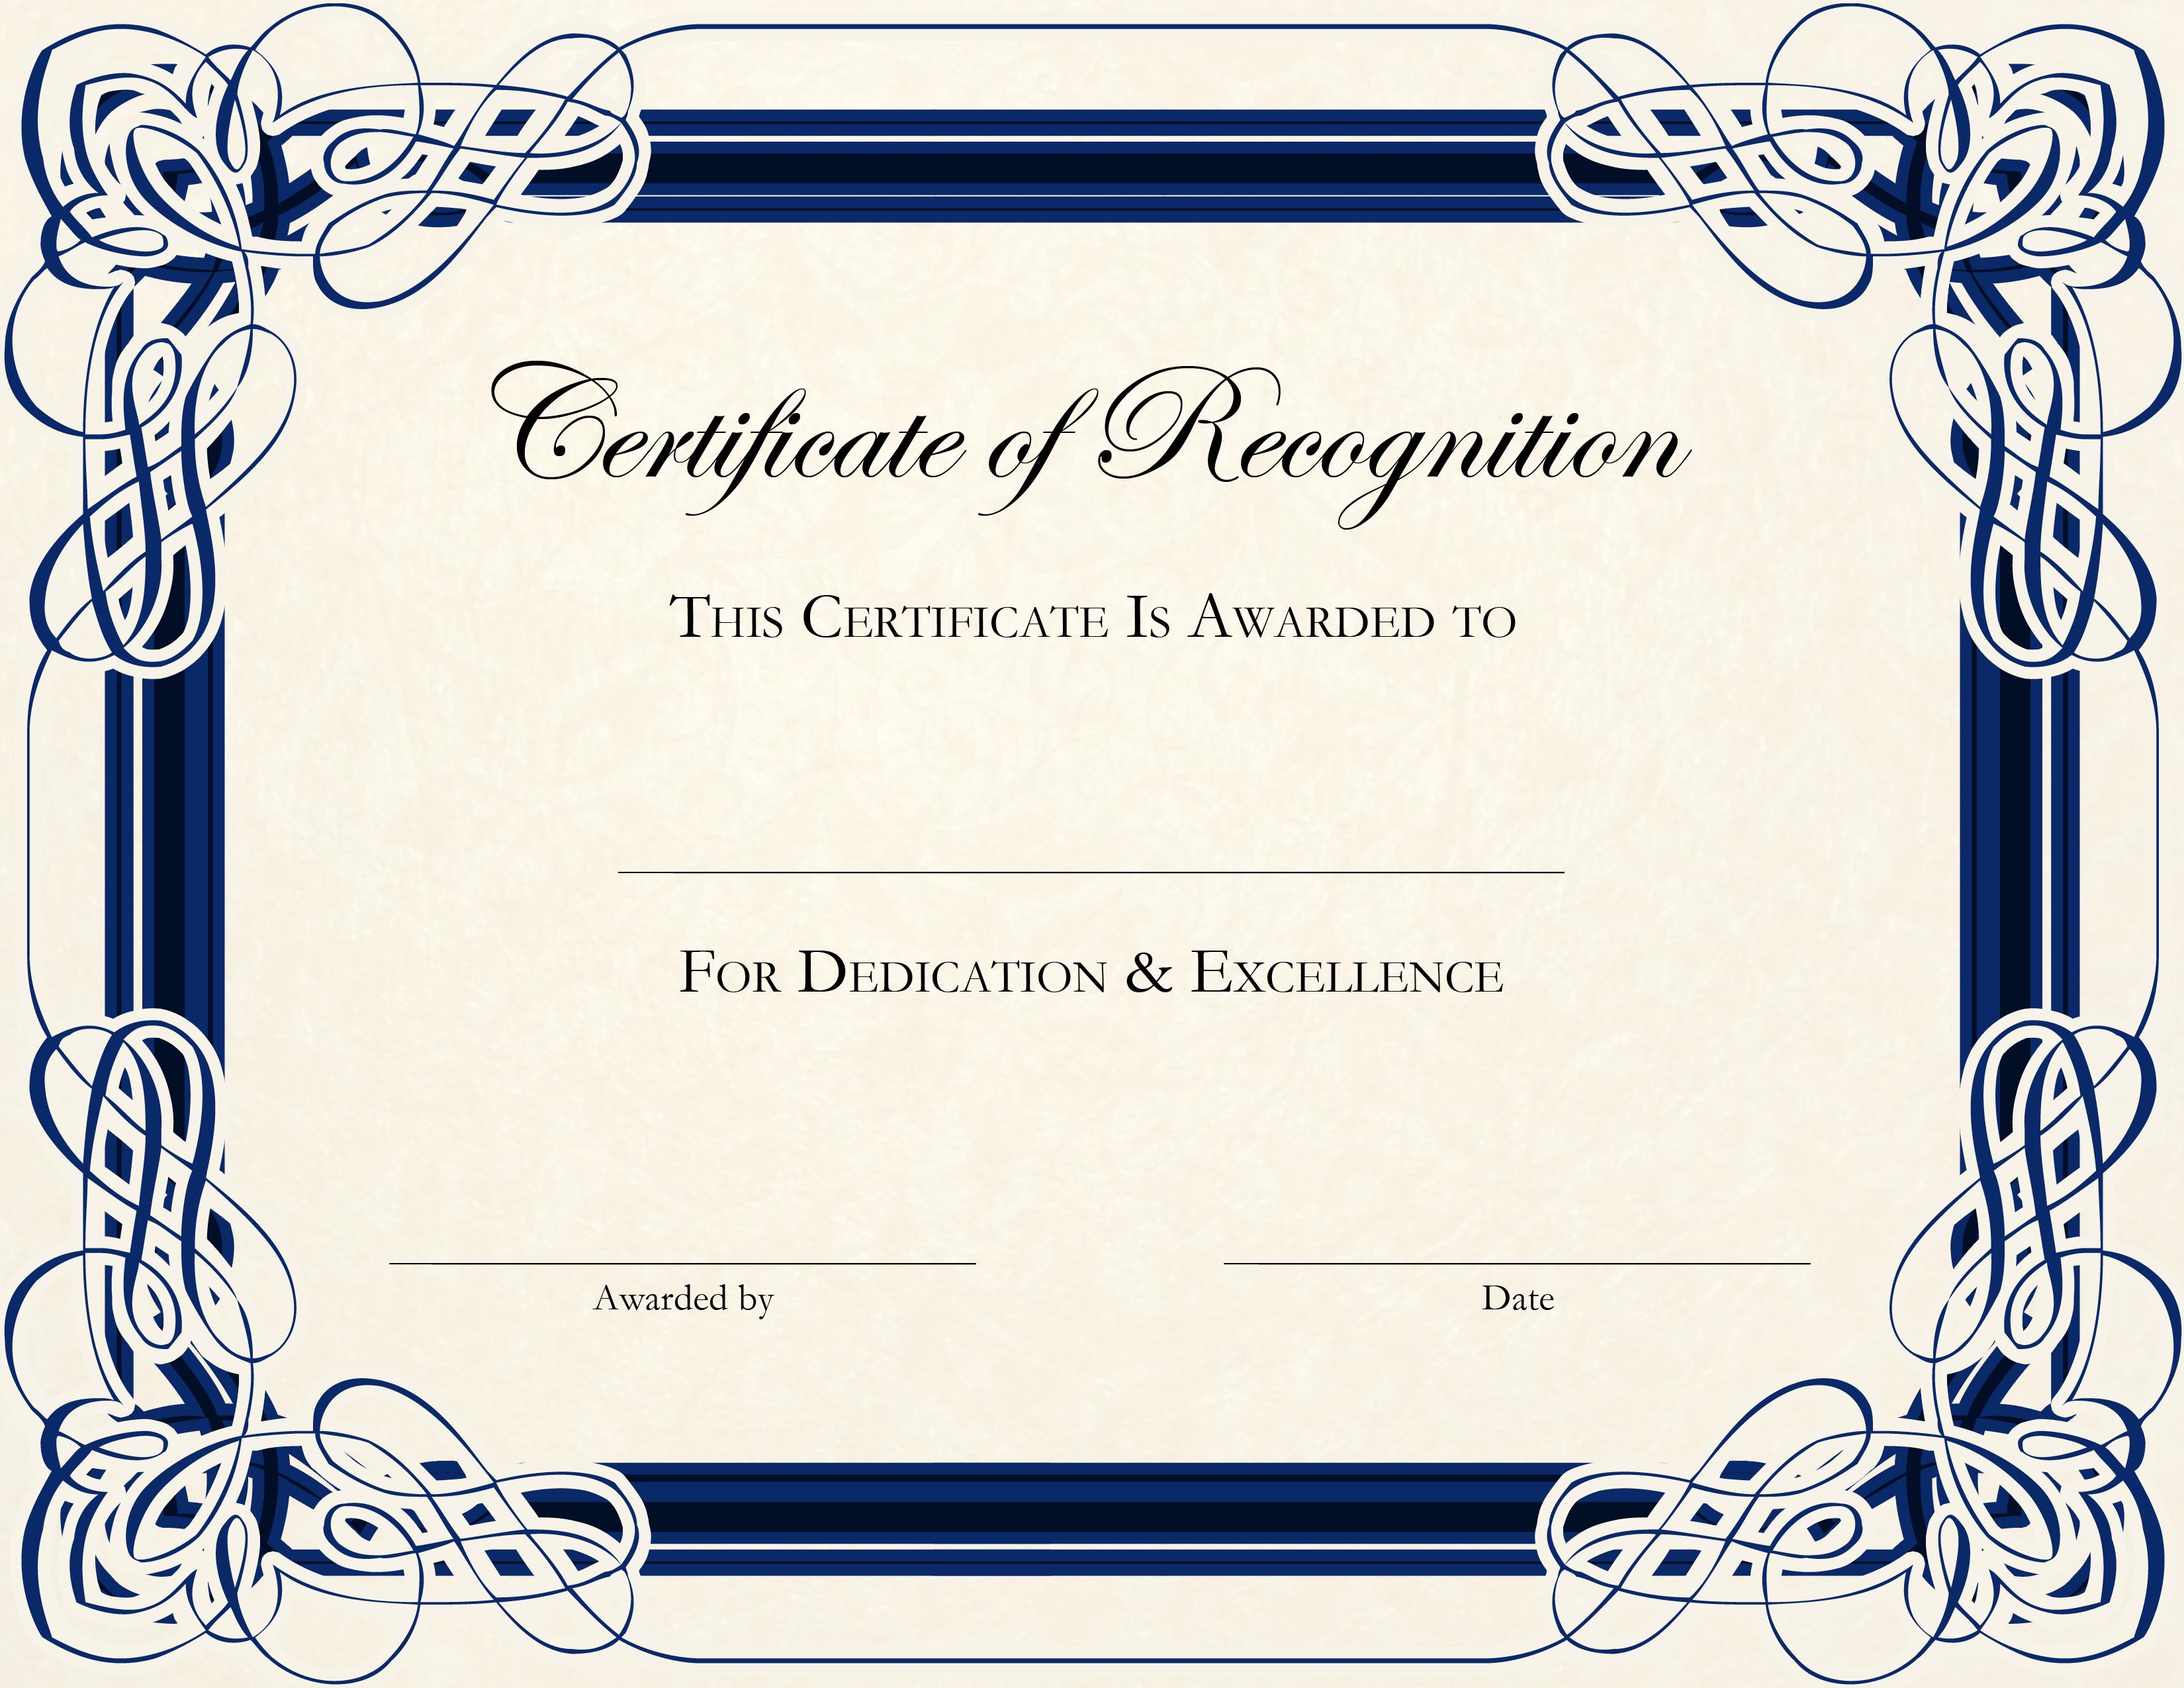 certificate template certificate design free certificate templates award certificate template free certificate - Free Templates For Certificates